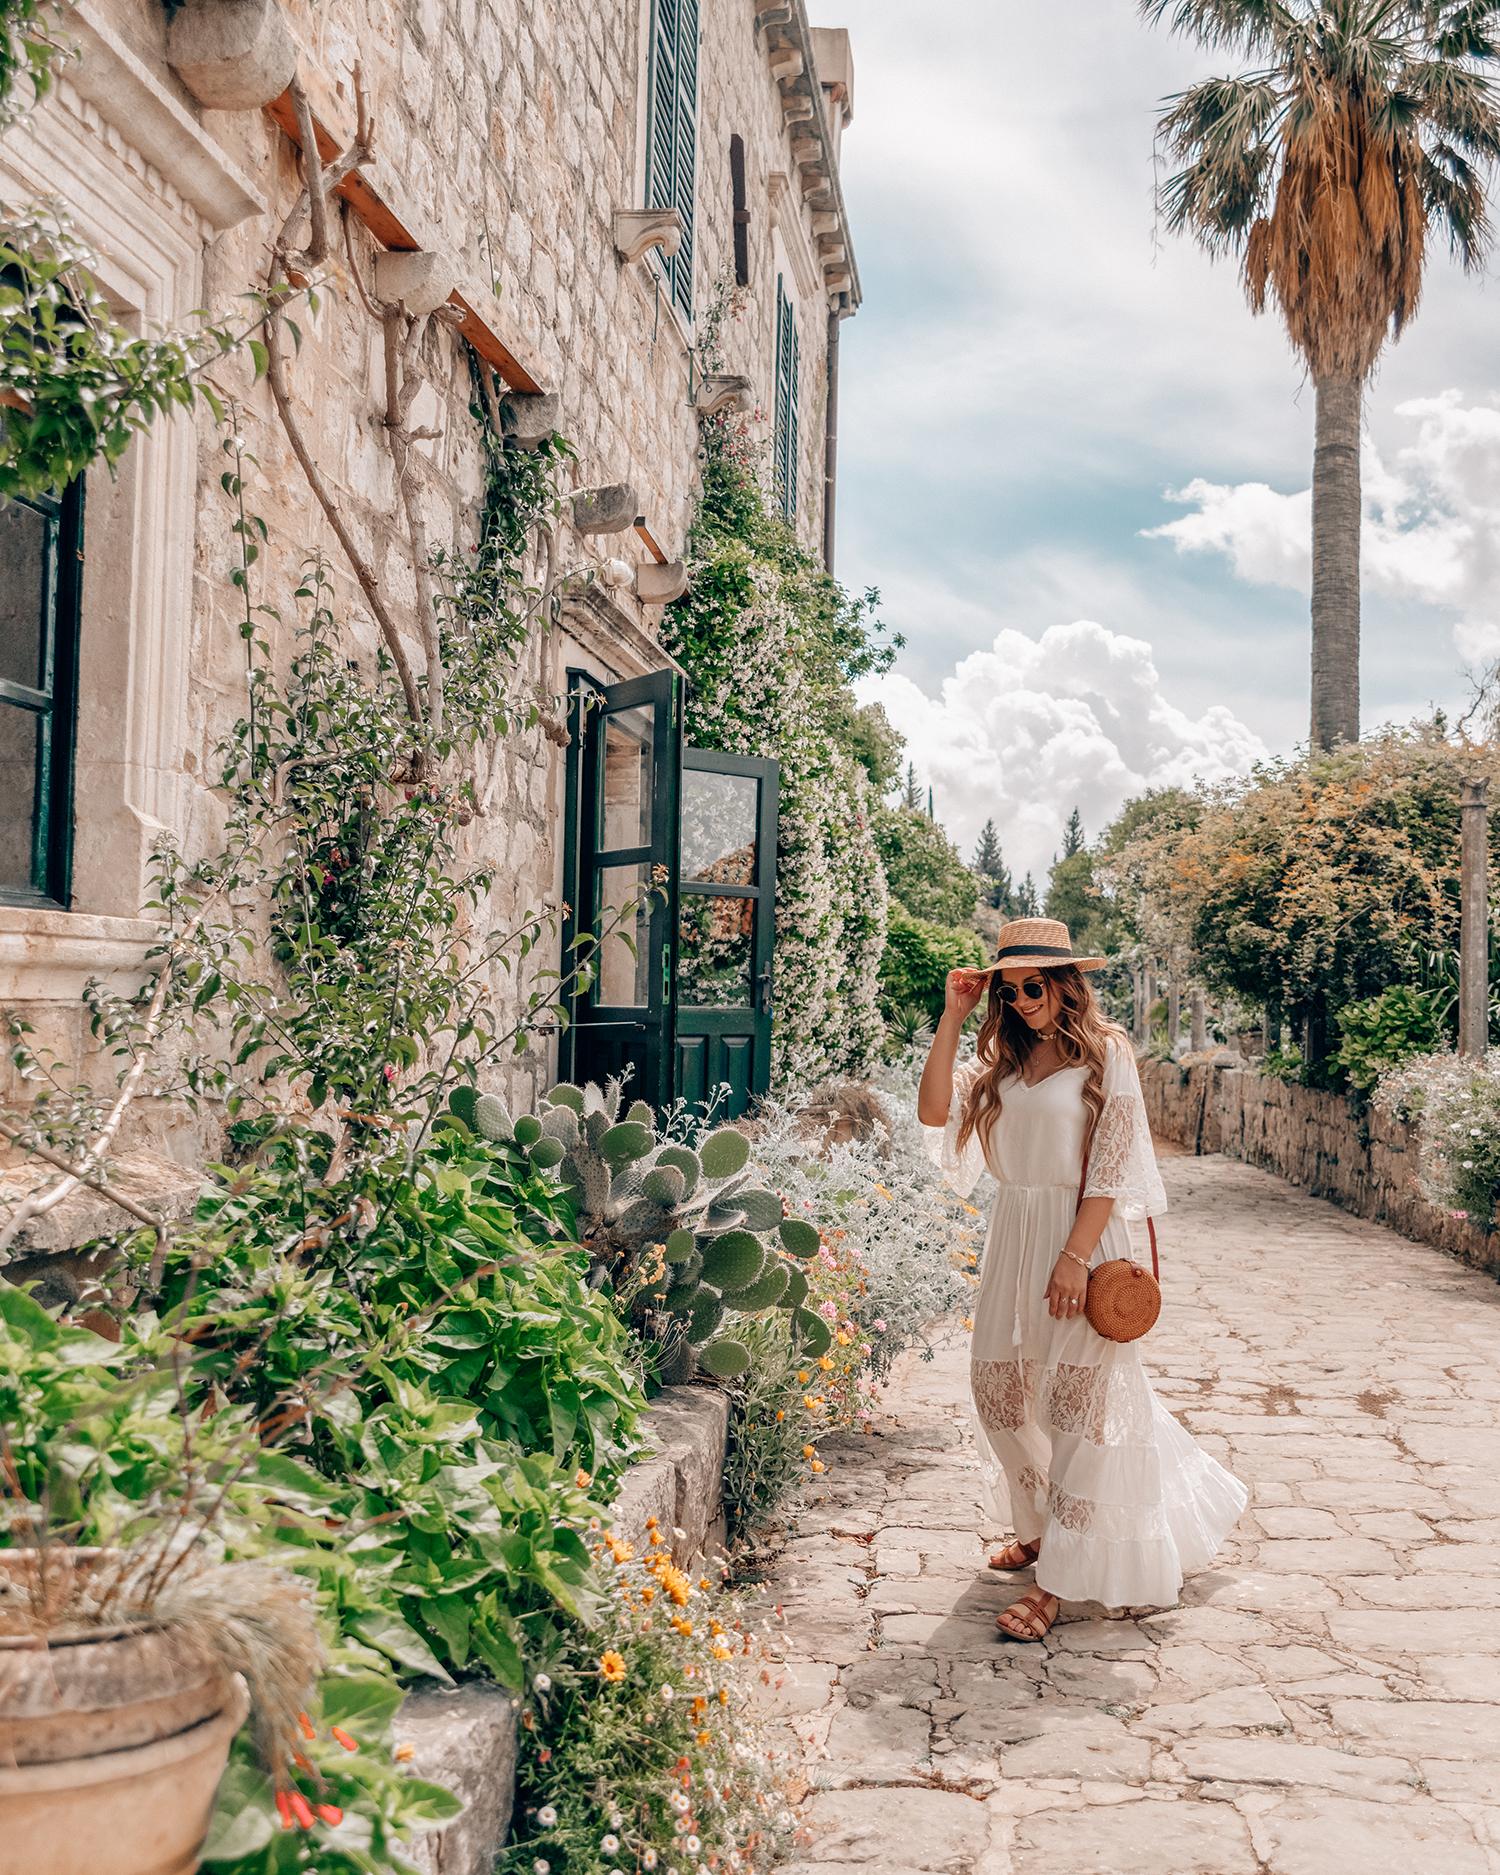 ADARAS Modeblogg - Dubrovnik